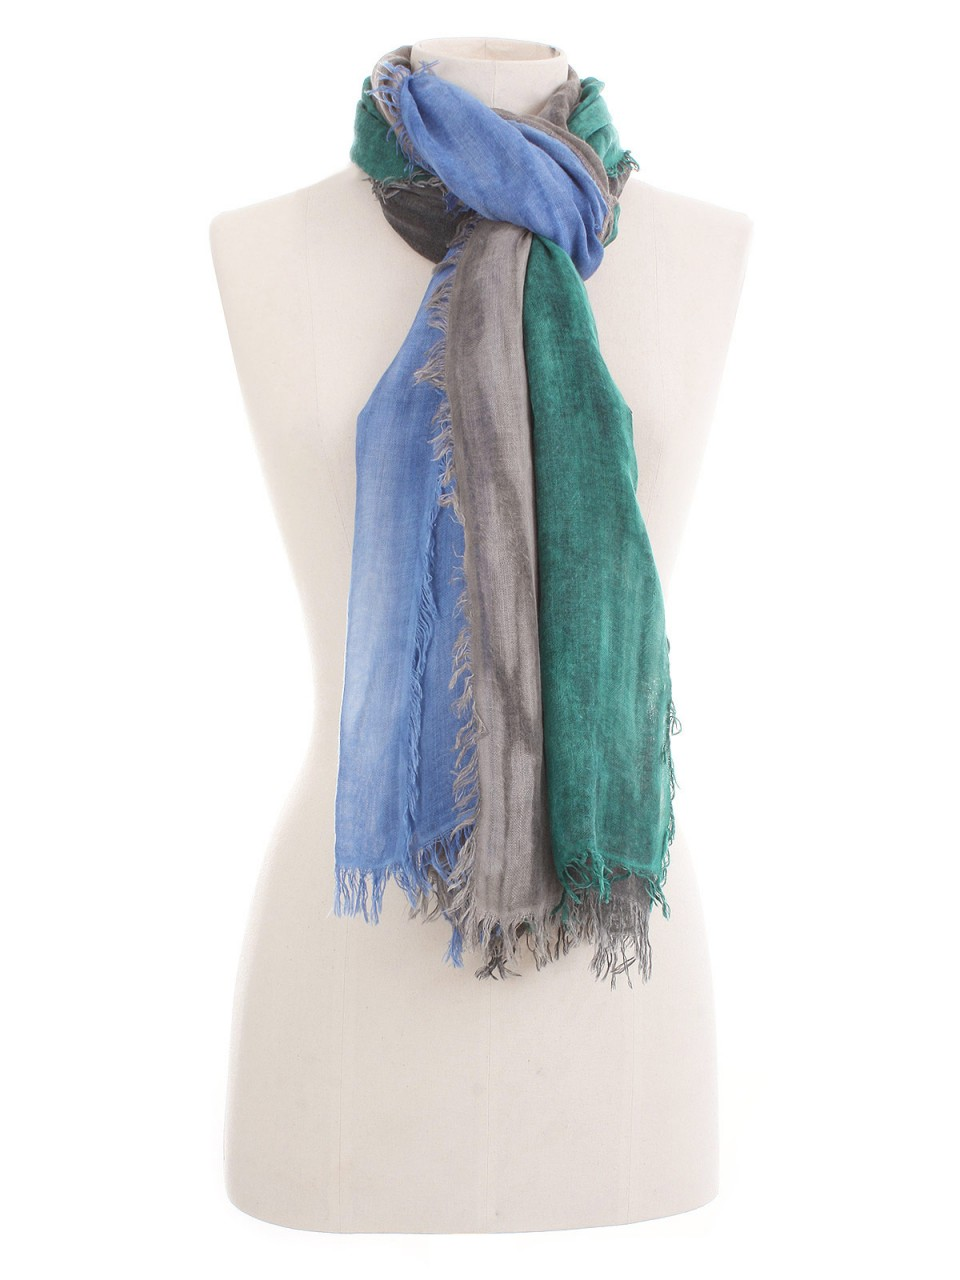 365 ITALY Damen Tuch mit Kaschmir, grau-grün-blau